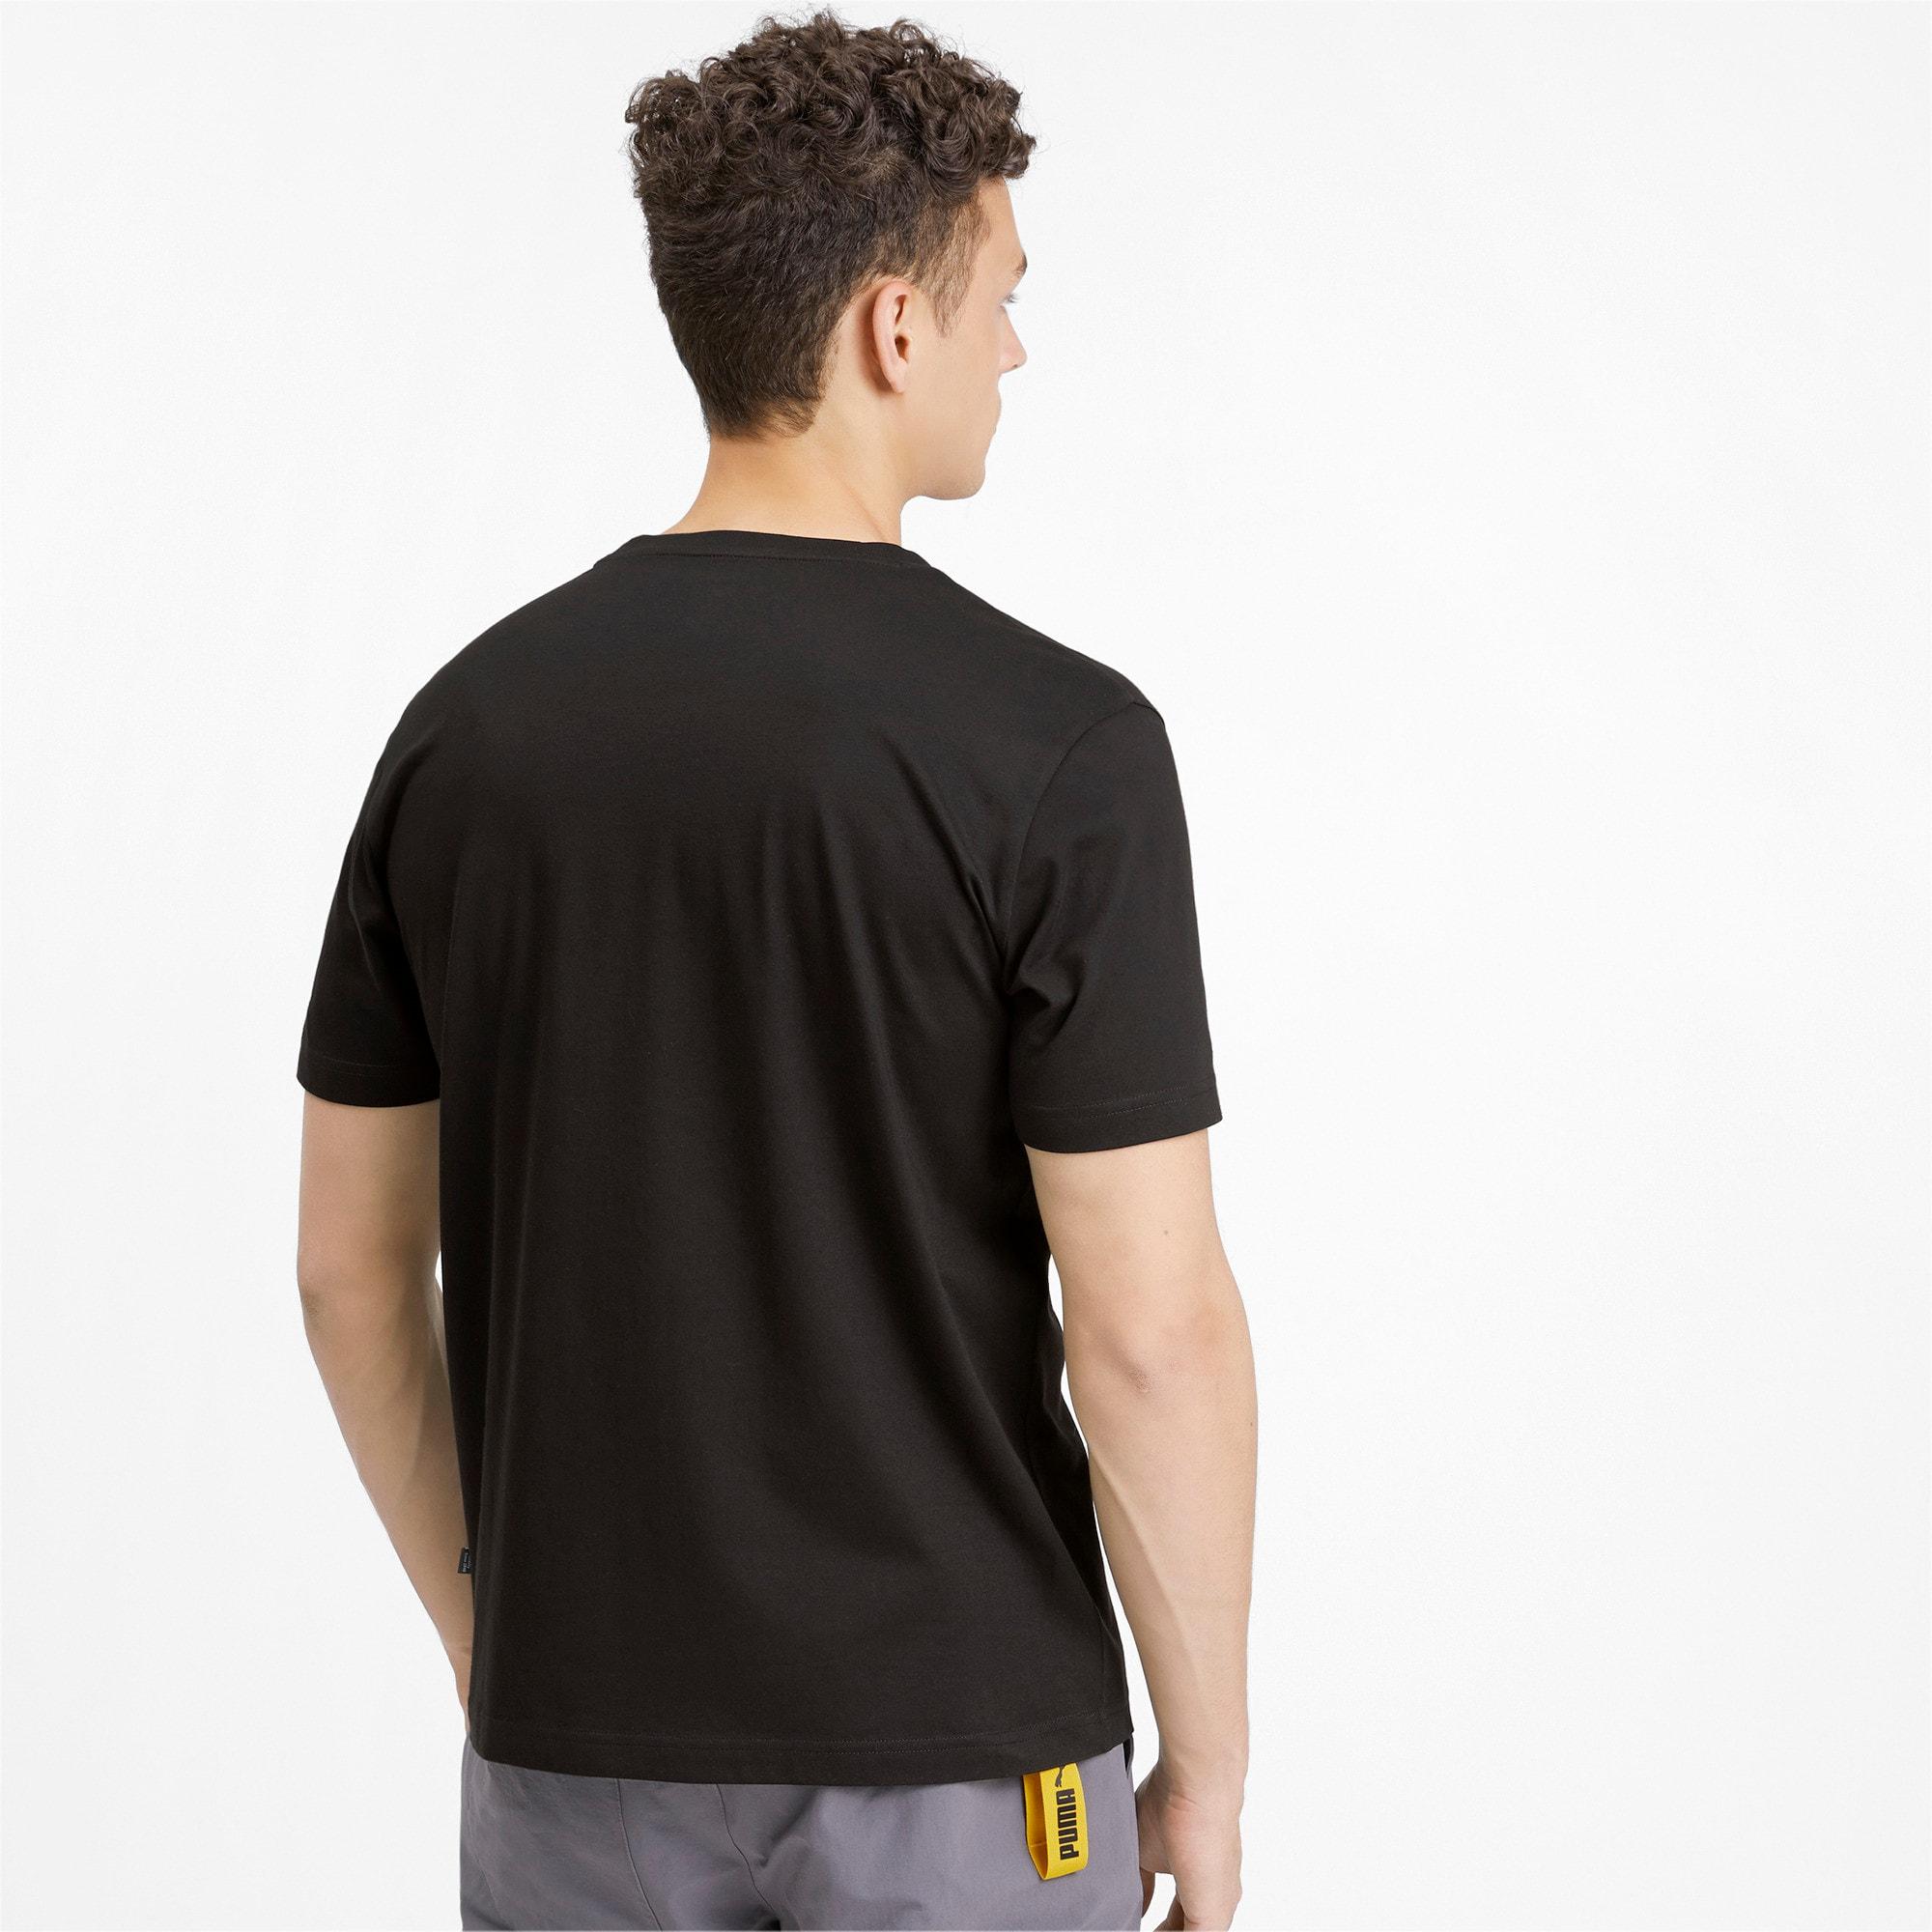 Thumbnail 2 of PUMA Brand Graphic Men's Tee, Puma Black, medium